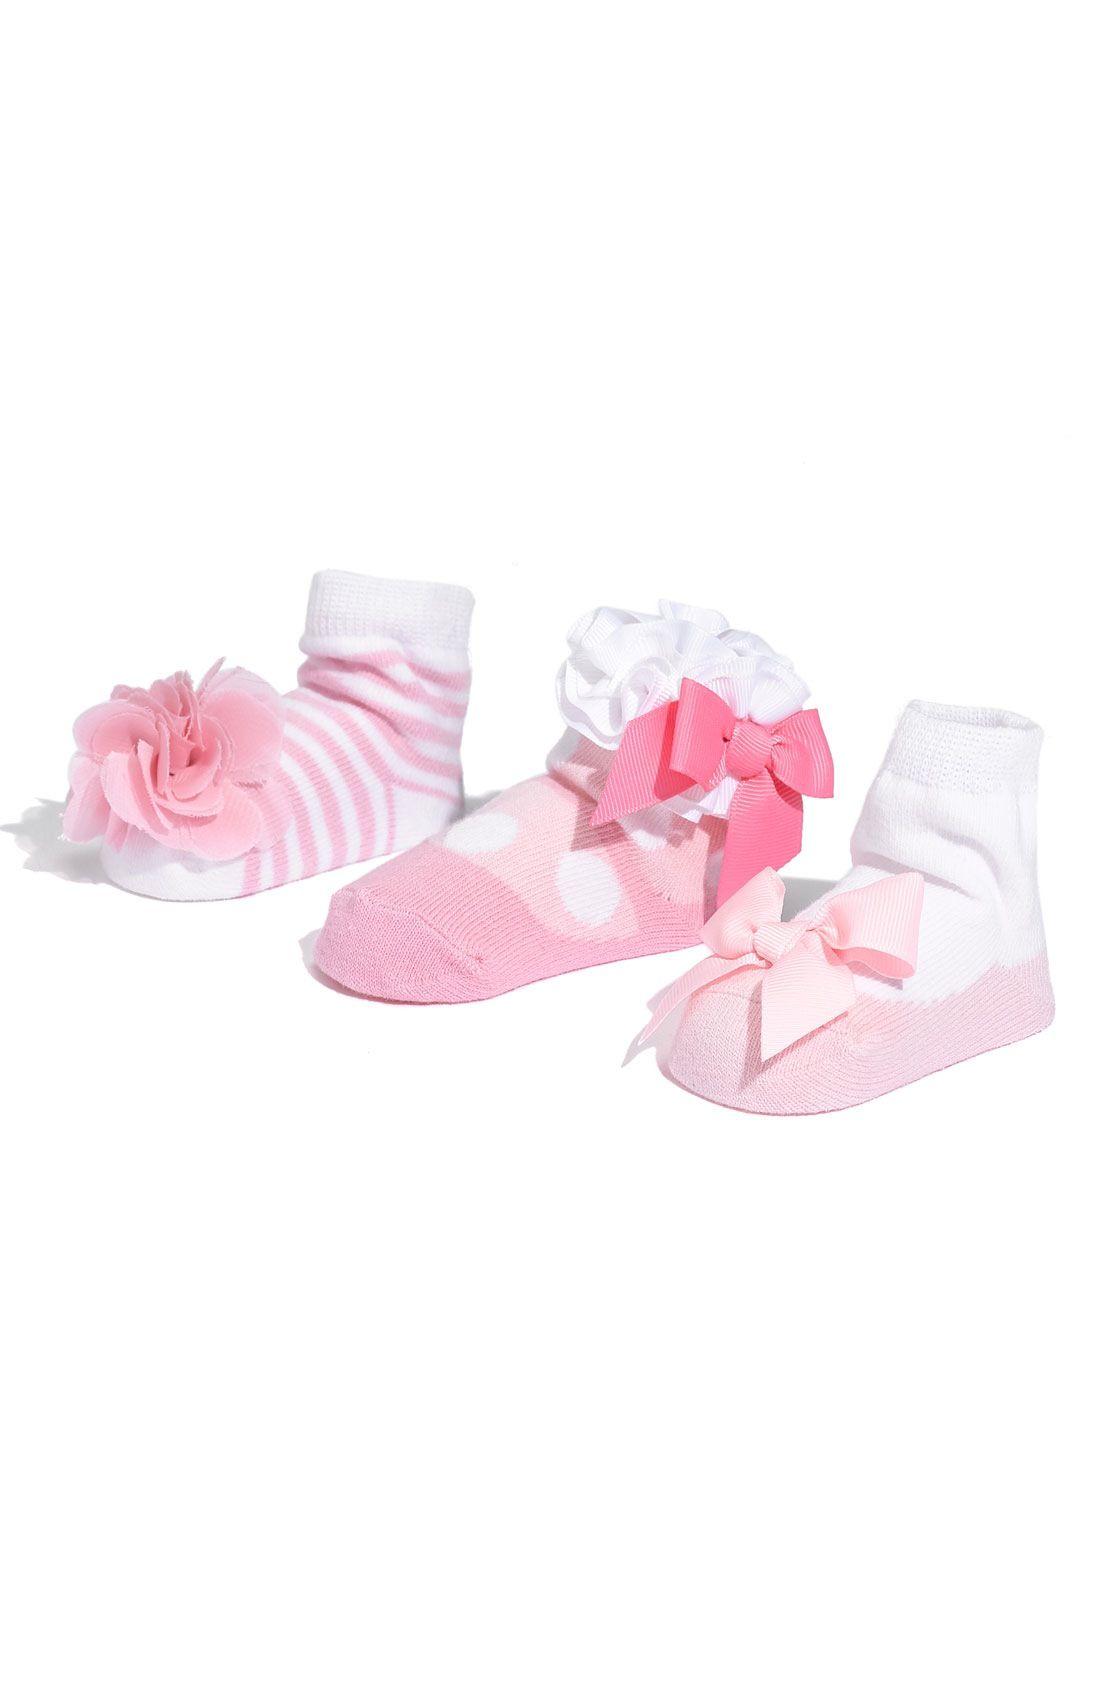 Mud Pie Baby Girls Socks Set